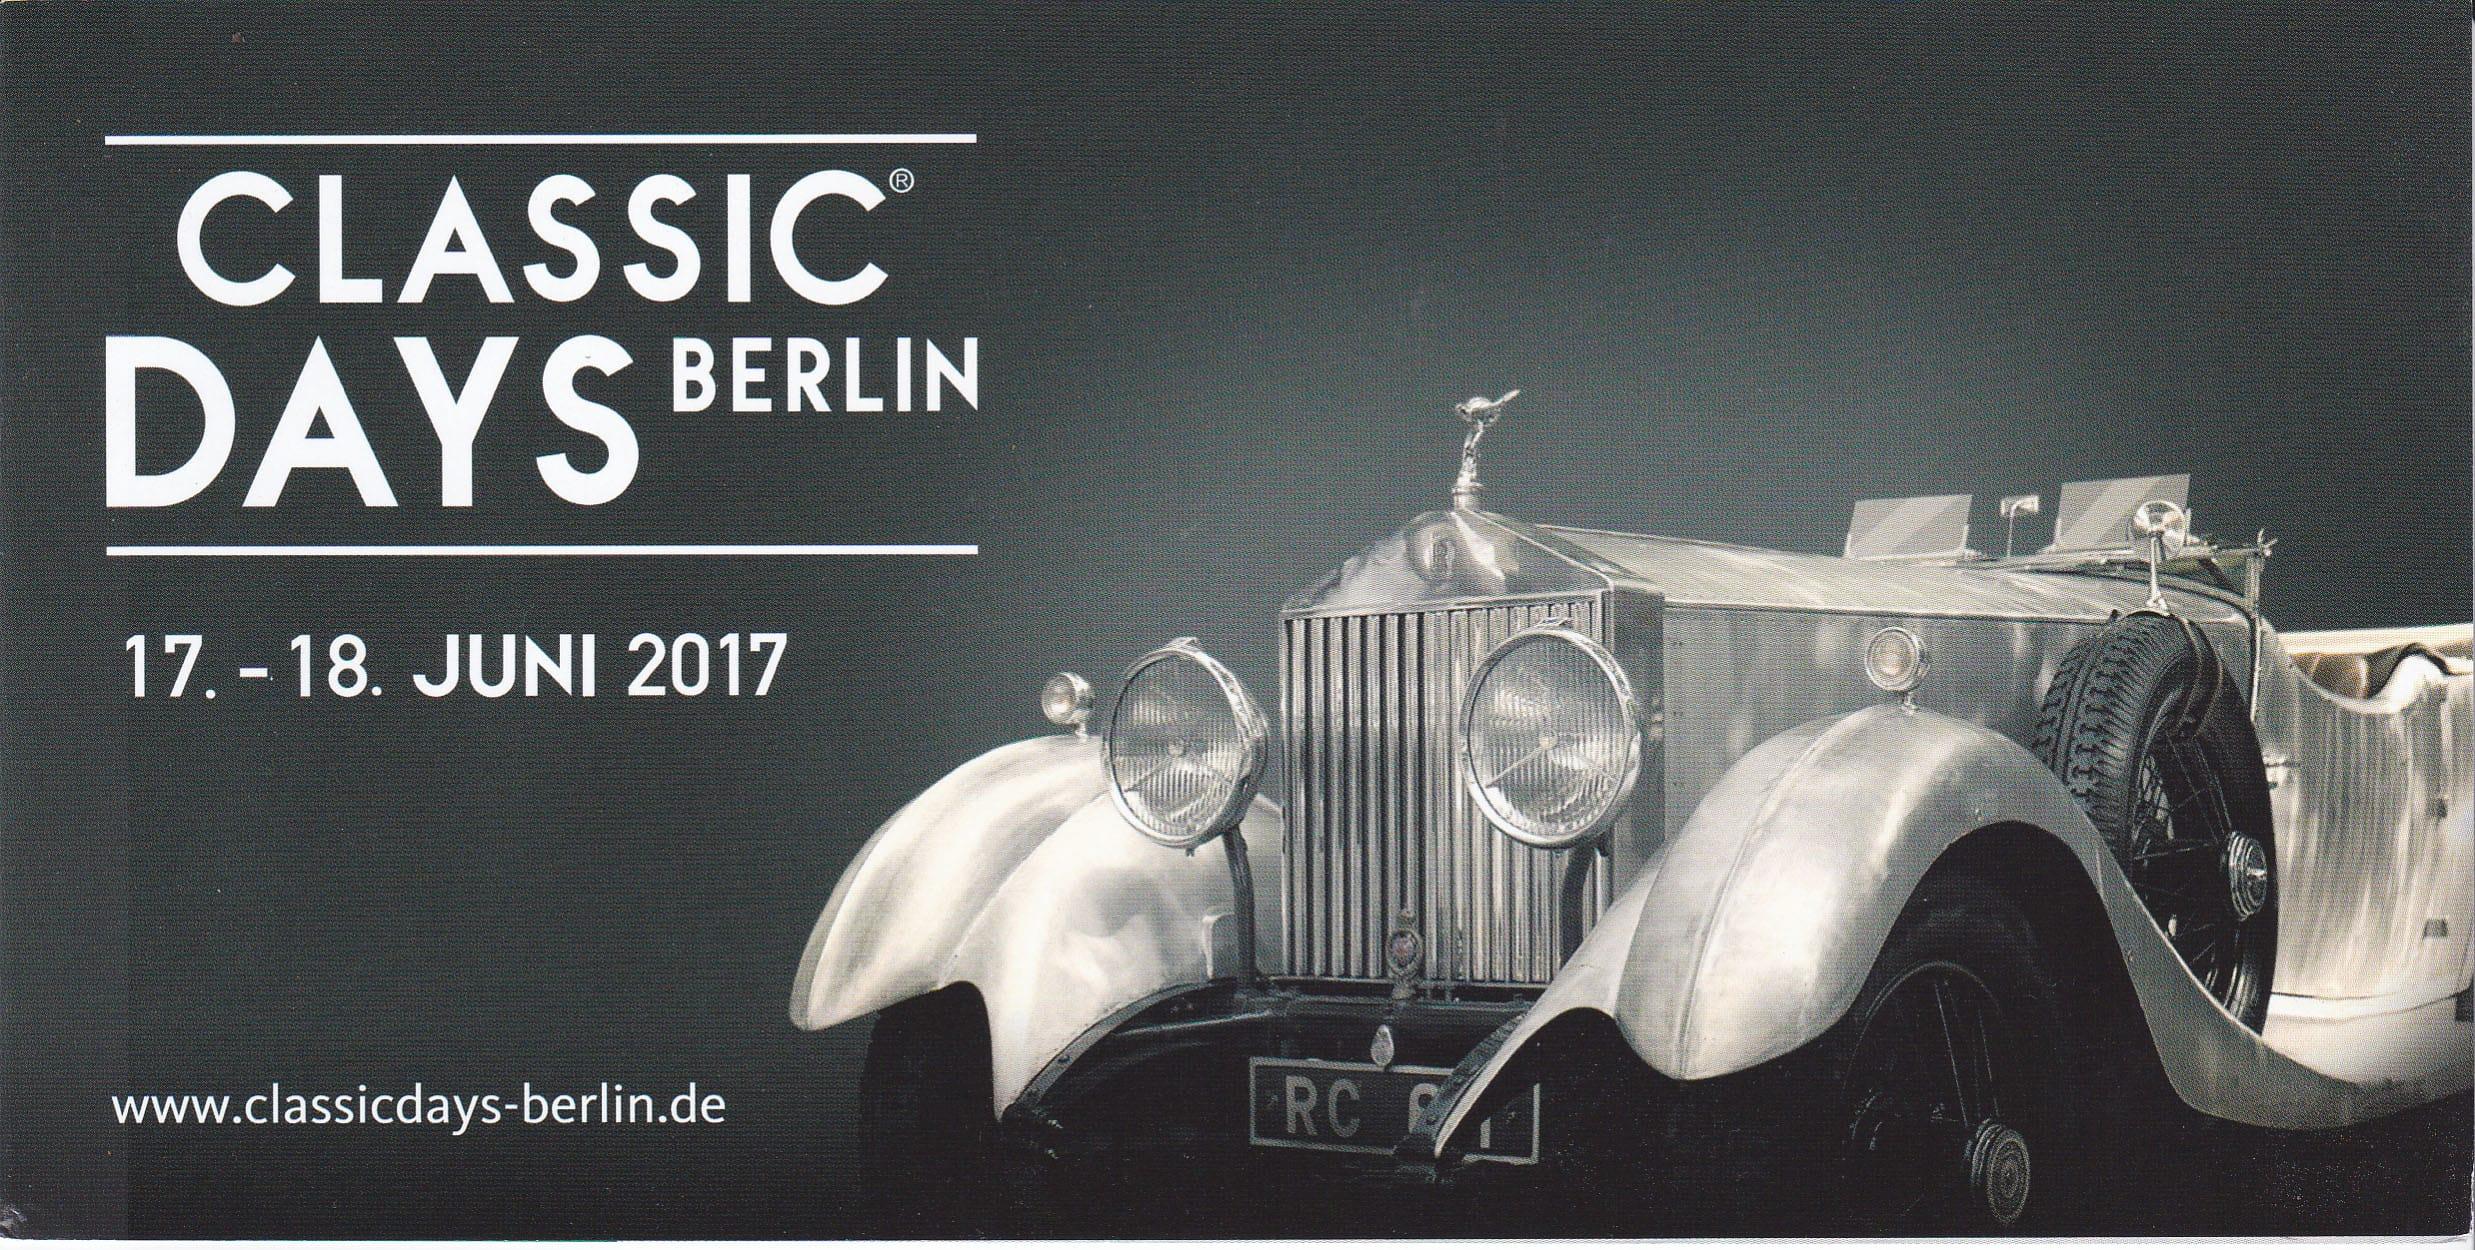 Classic Days Berlin